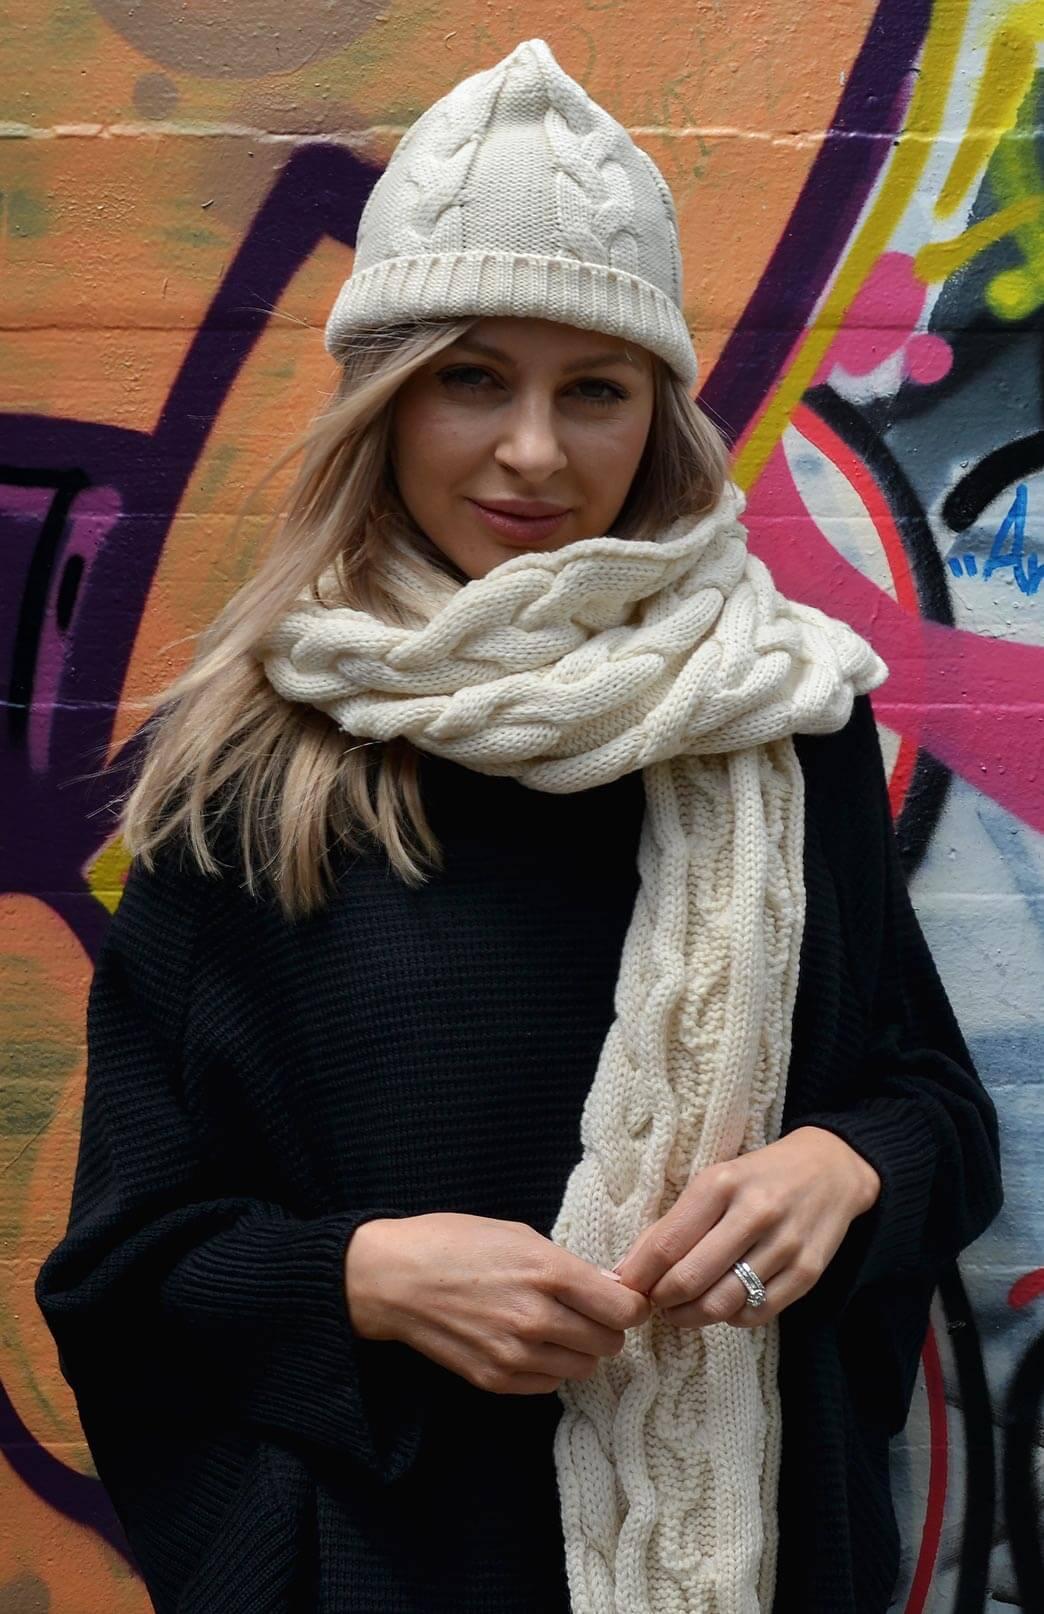 Beanies - Chunky Cable Knit - Women's Vanilla Cream Cable Knit Chunky Wool Beanie - Smitten Merino Tasmania Australia